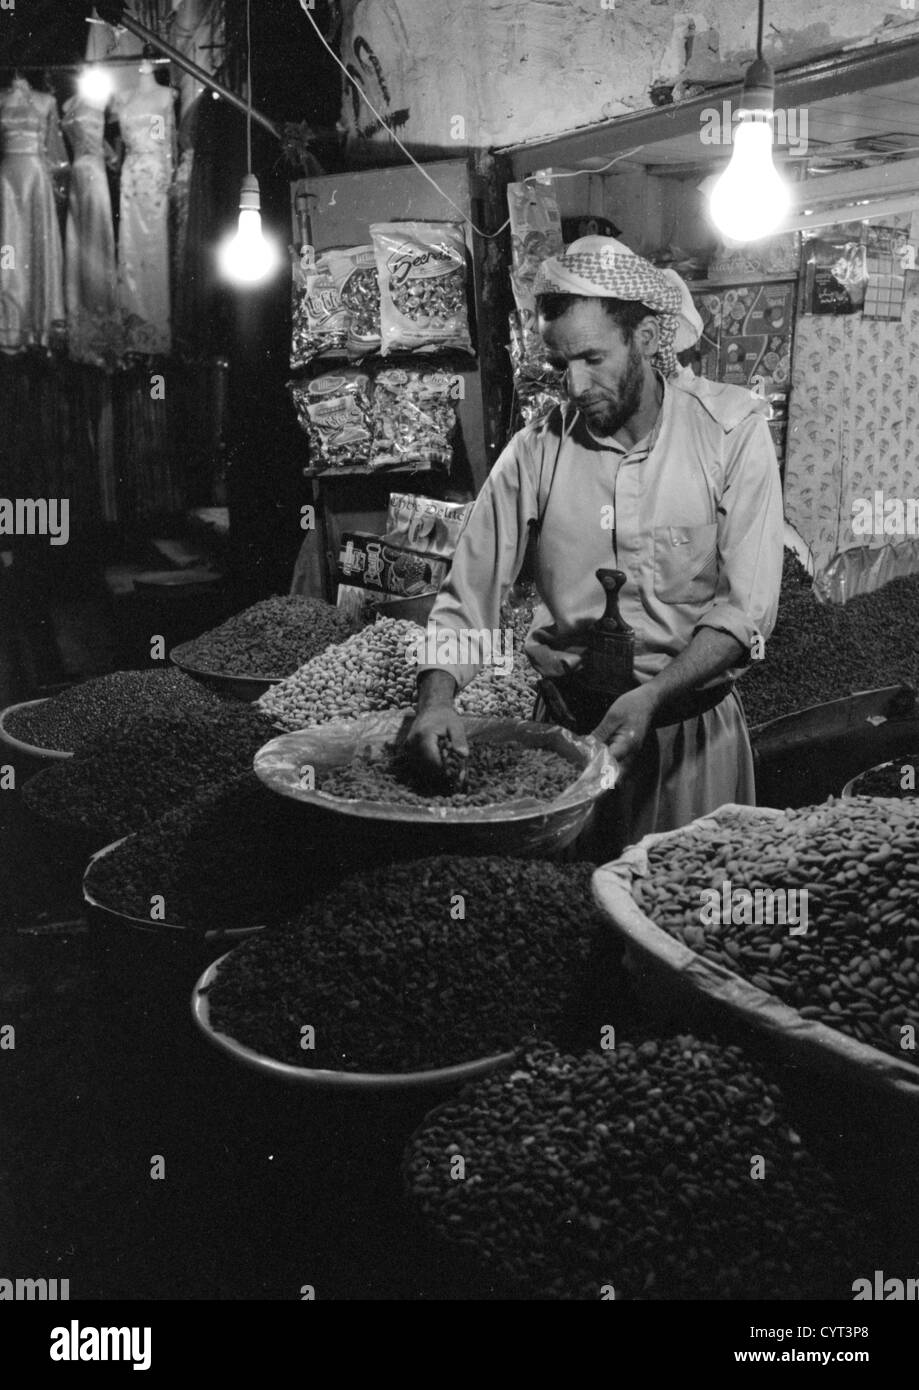 Yemeni Grocer Picking Up Grains In The Souq, Sanaa, Yemen - Stock Image